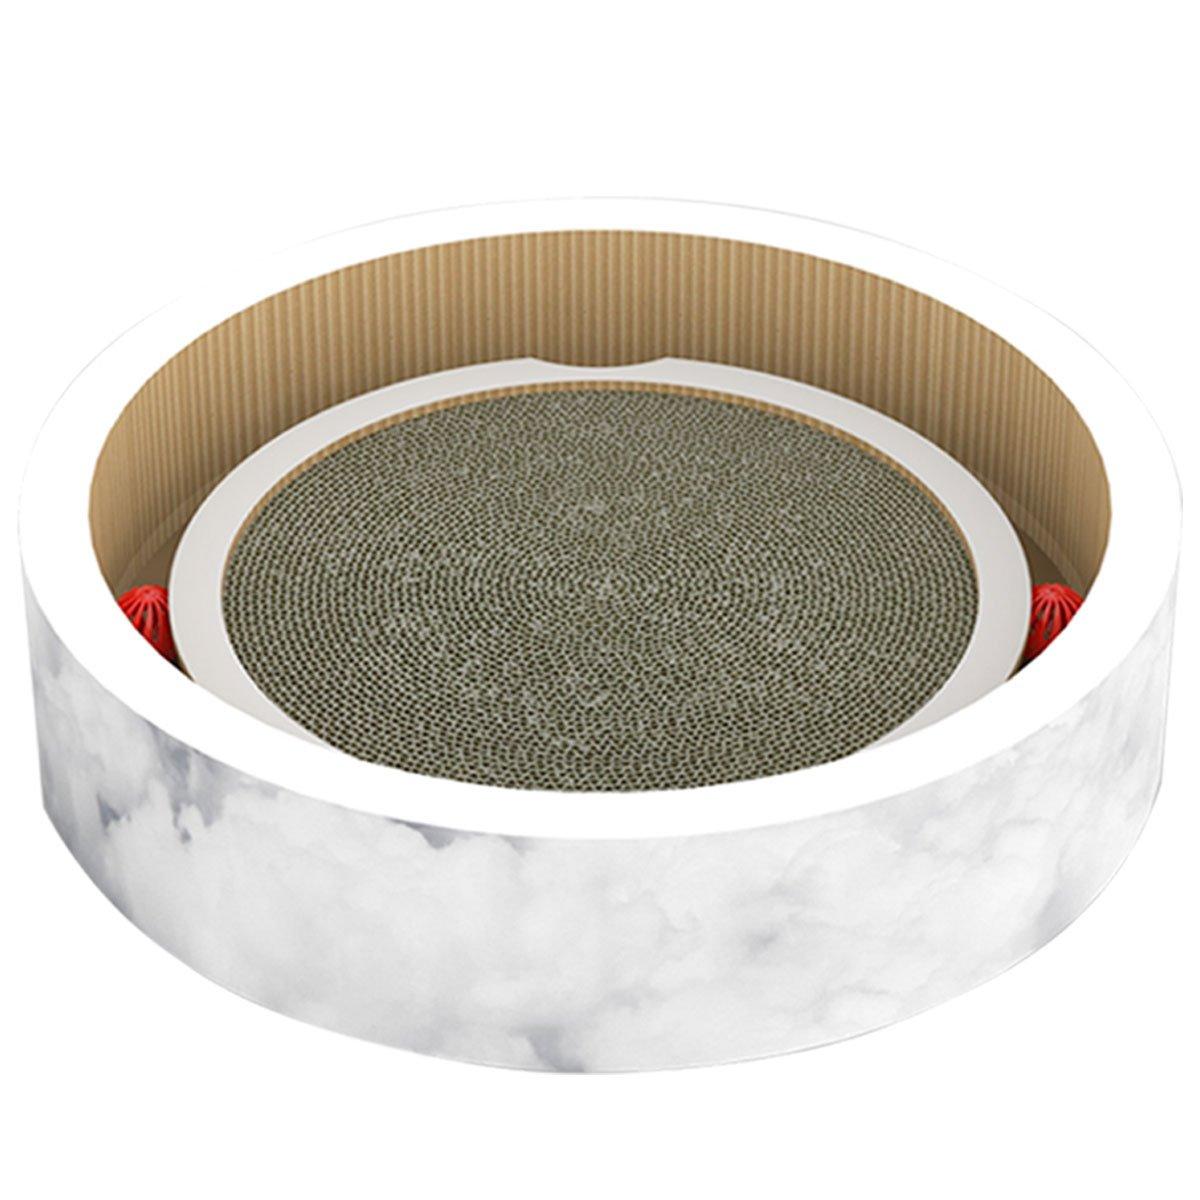 pidan Yoyo Premium Cardboard Scratcher Lounge, White by pidan